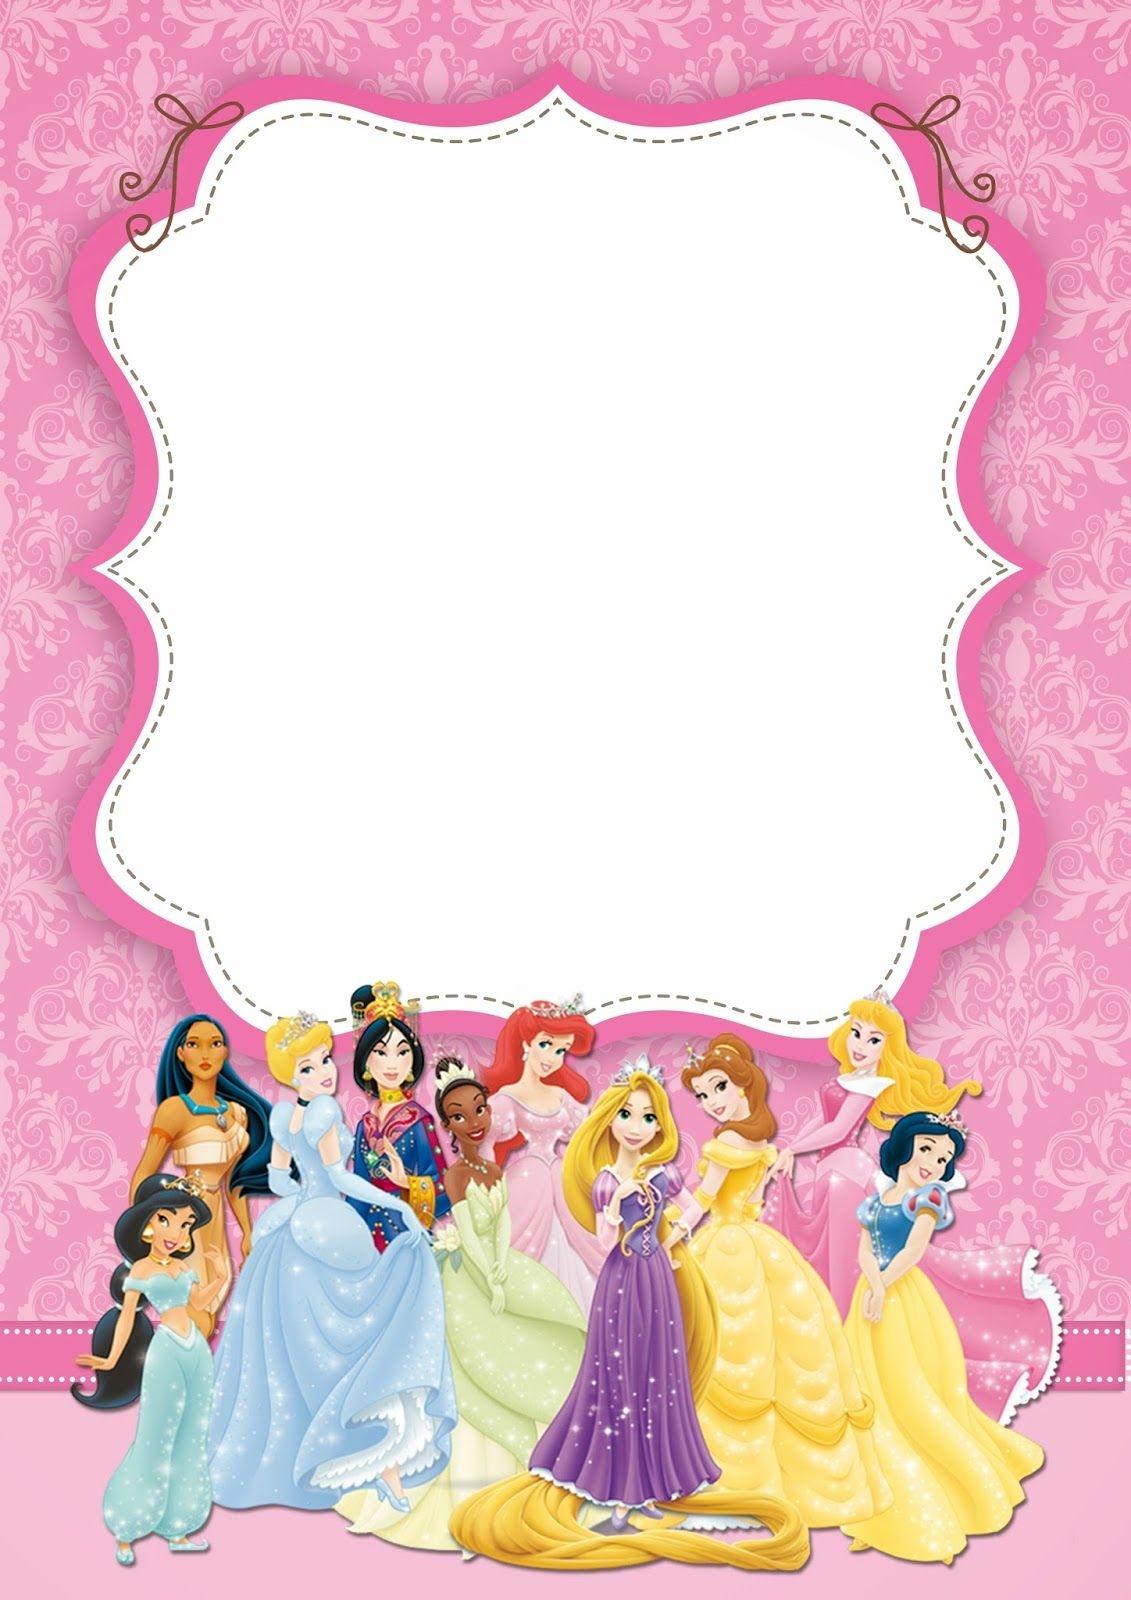 Princess Birthday Invitations Template Free Disney - Tutlin.psstech.co - Free Princess Printable Invitations